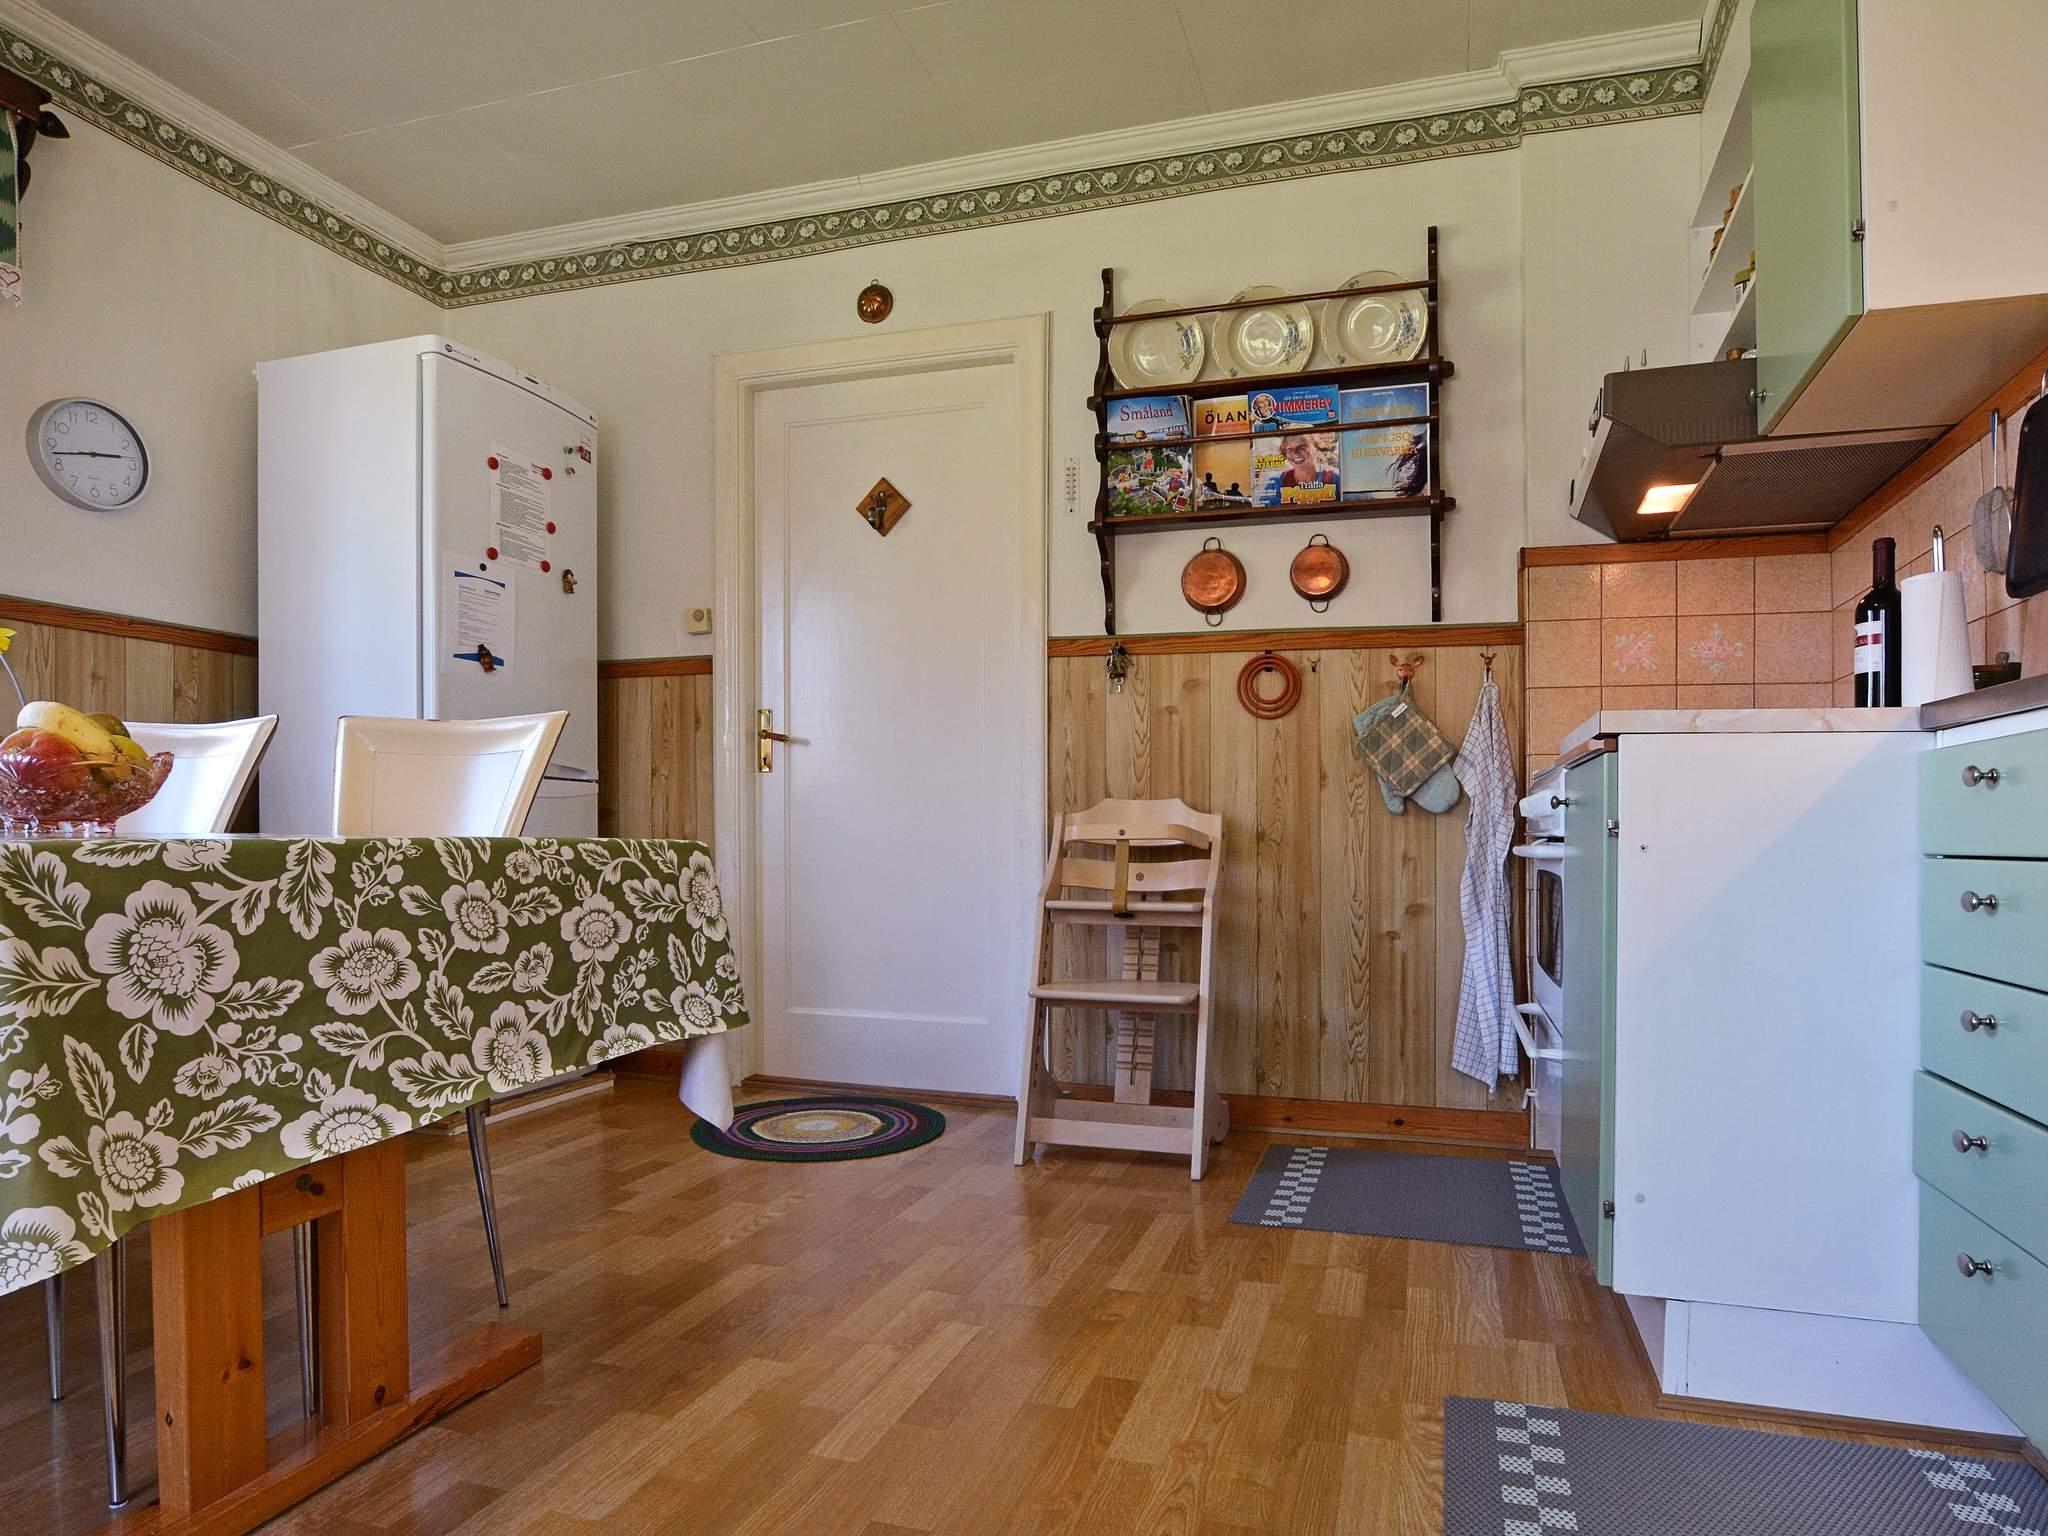 Ferienhaus Sandsjöfors (418764), Sandsjöfors, Jönköpings län, Südschweden, Schweden, Bild 6